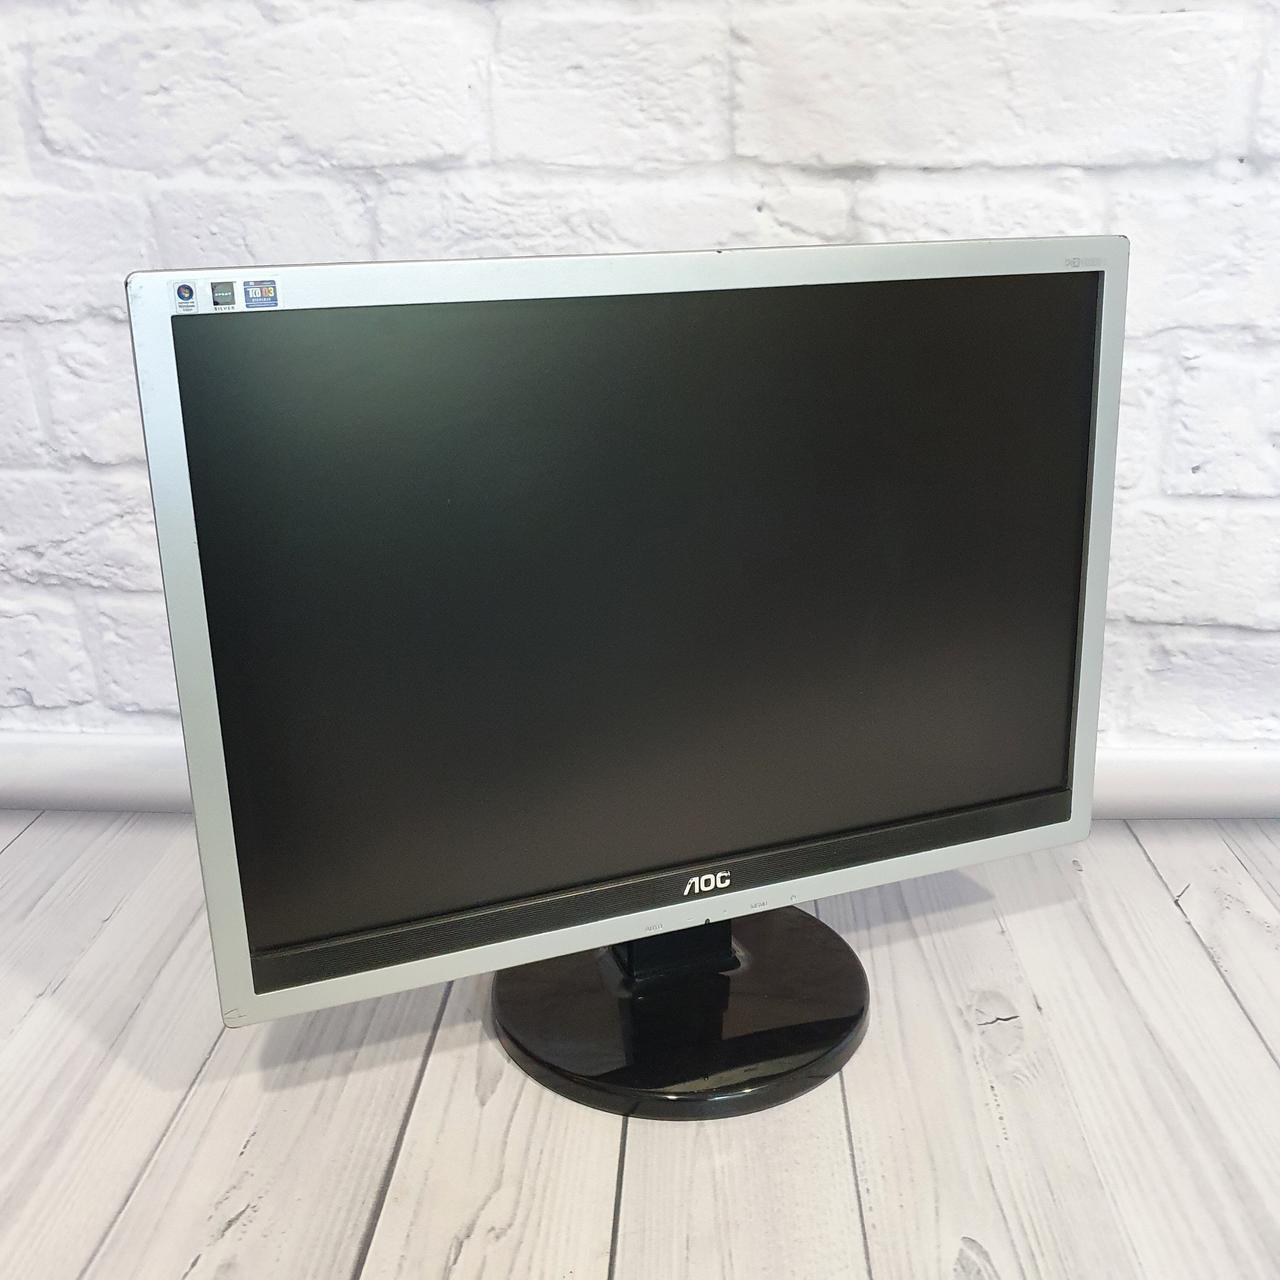 Монитор AOS 19  (Матрица TN / DVI, VGA,DisplayPort / Разрешение 1680x1050)